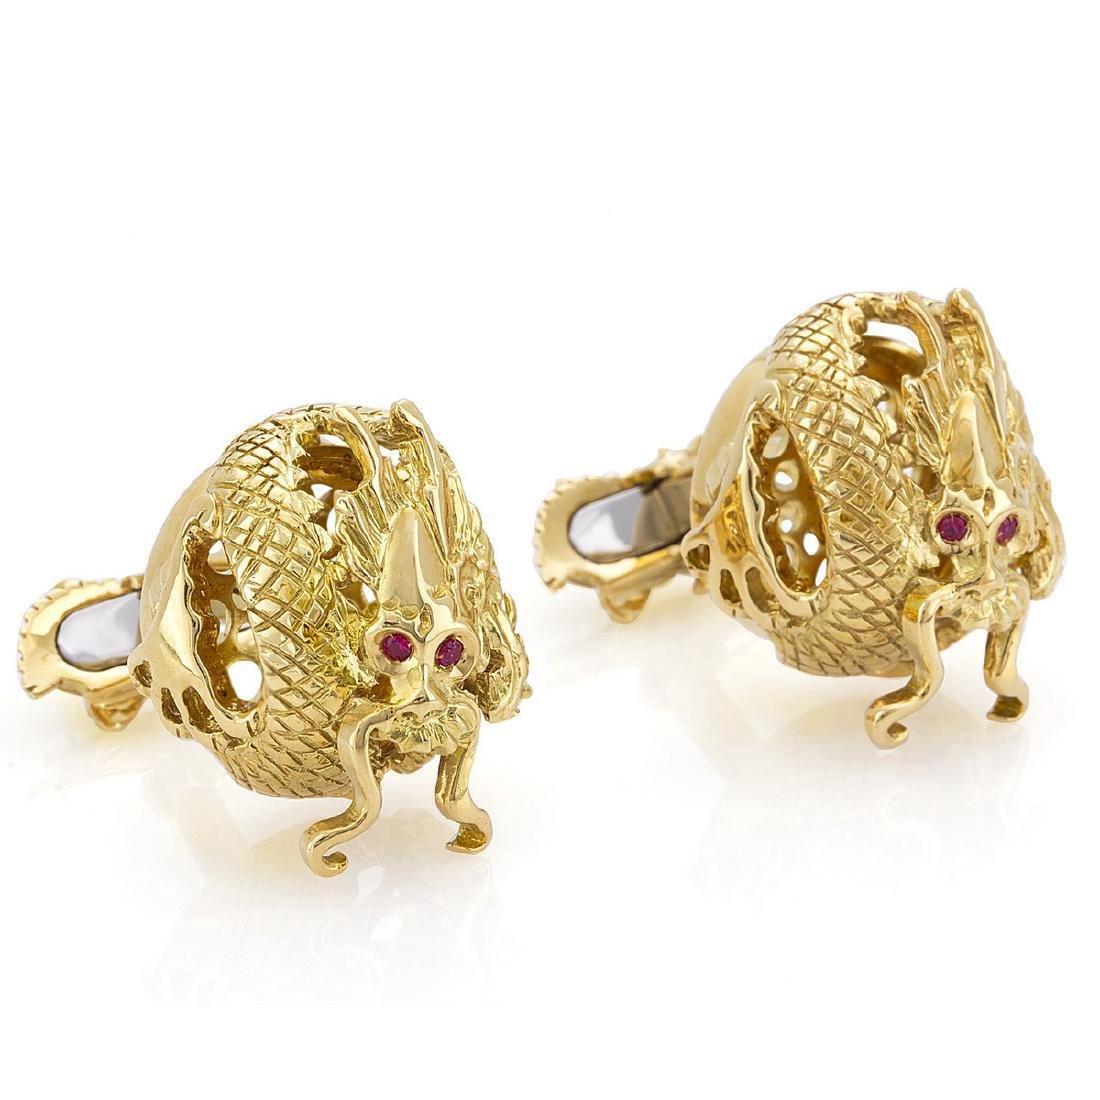 Montegrappa 18K Gold/Silver Figural Dragon Cufflinks